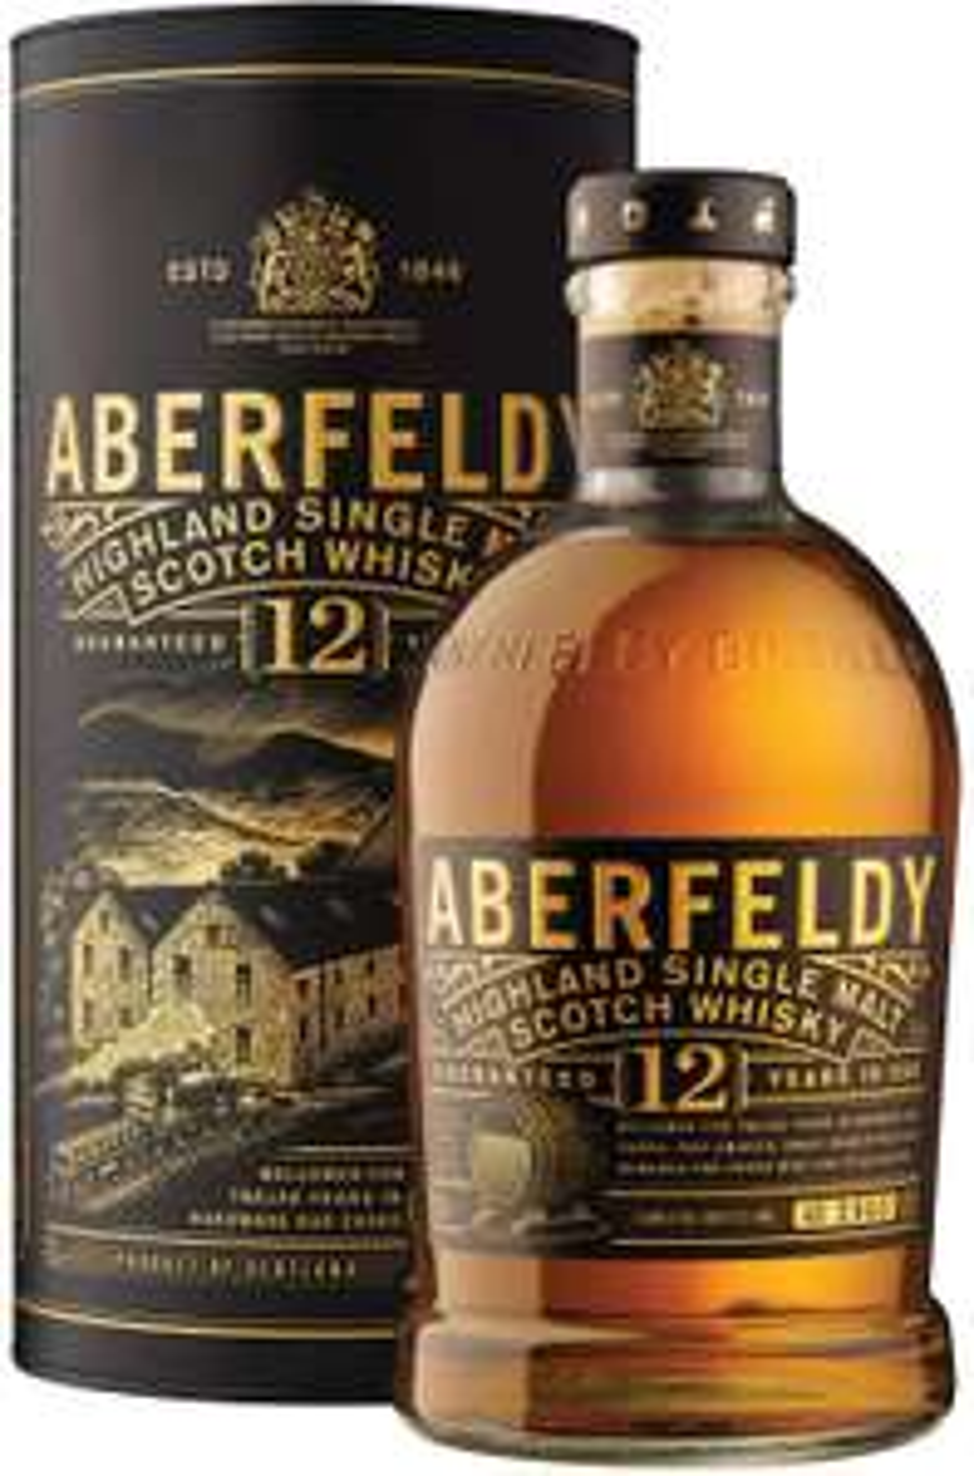 Aberfeldy 12 Year Old Single Malt Scotch Whisky £23.08 @ Tesco Batley